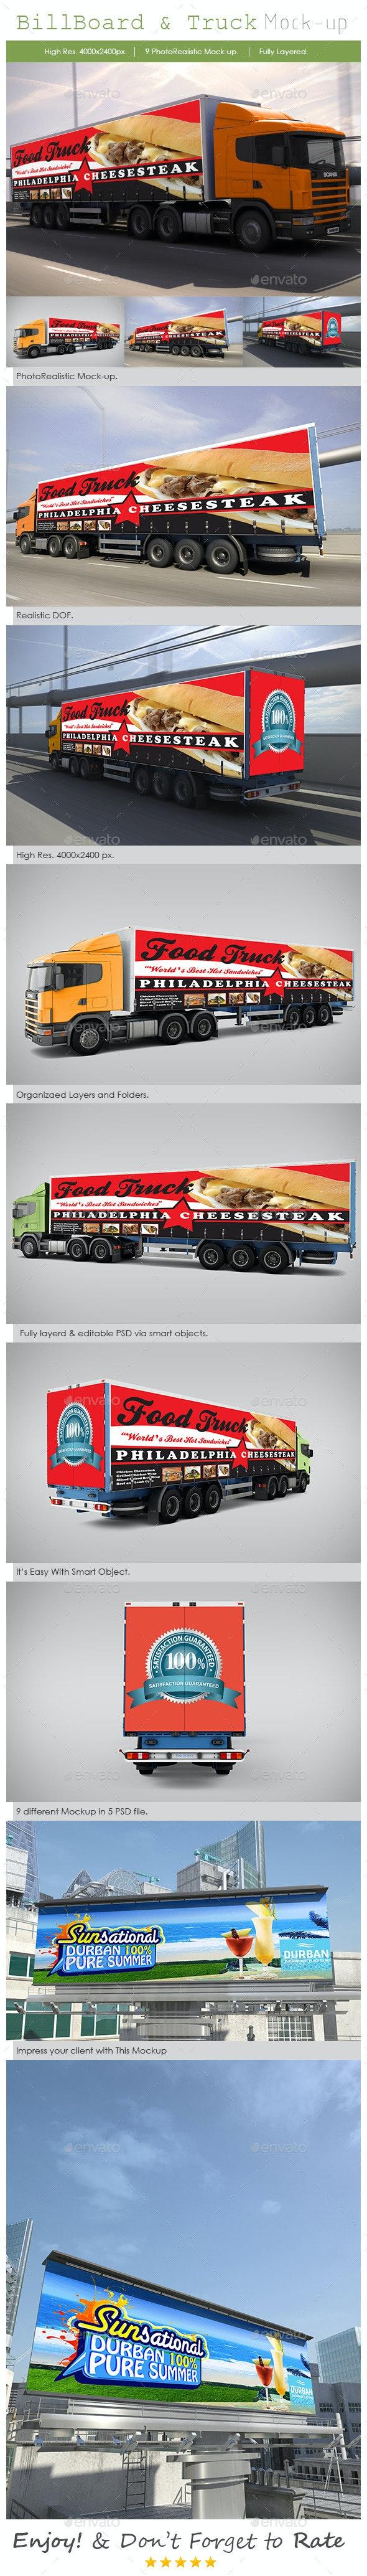 Billboard and Truck Mock-Up - Print Product Mock-Ups